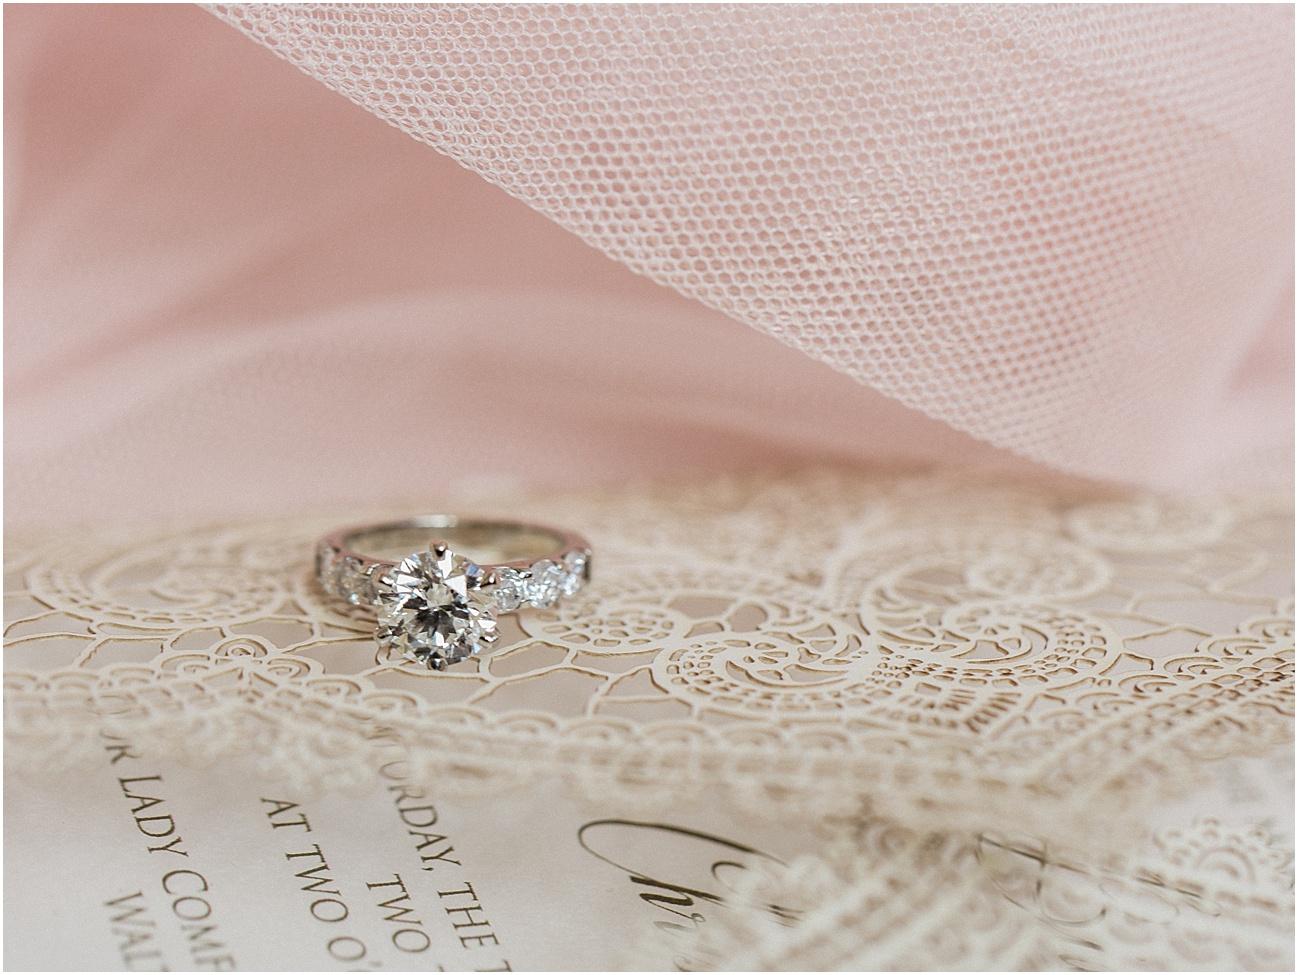 bianca_chris_danversport_italian_blush_gold_north_shore_cape_cod_boston_wedding_photographer_meredith_jane_photography_photo_1101.jpg